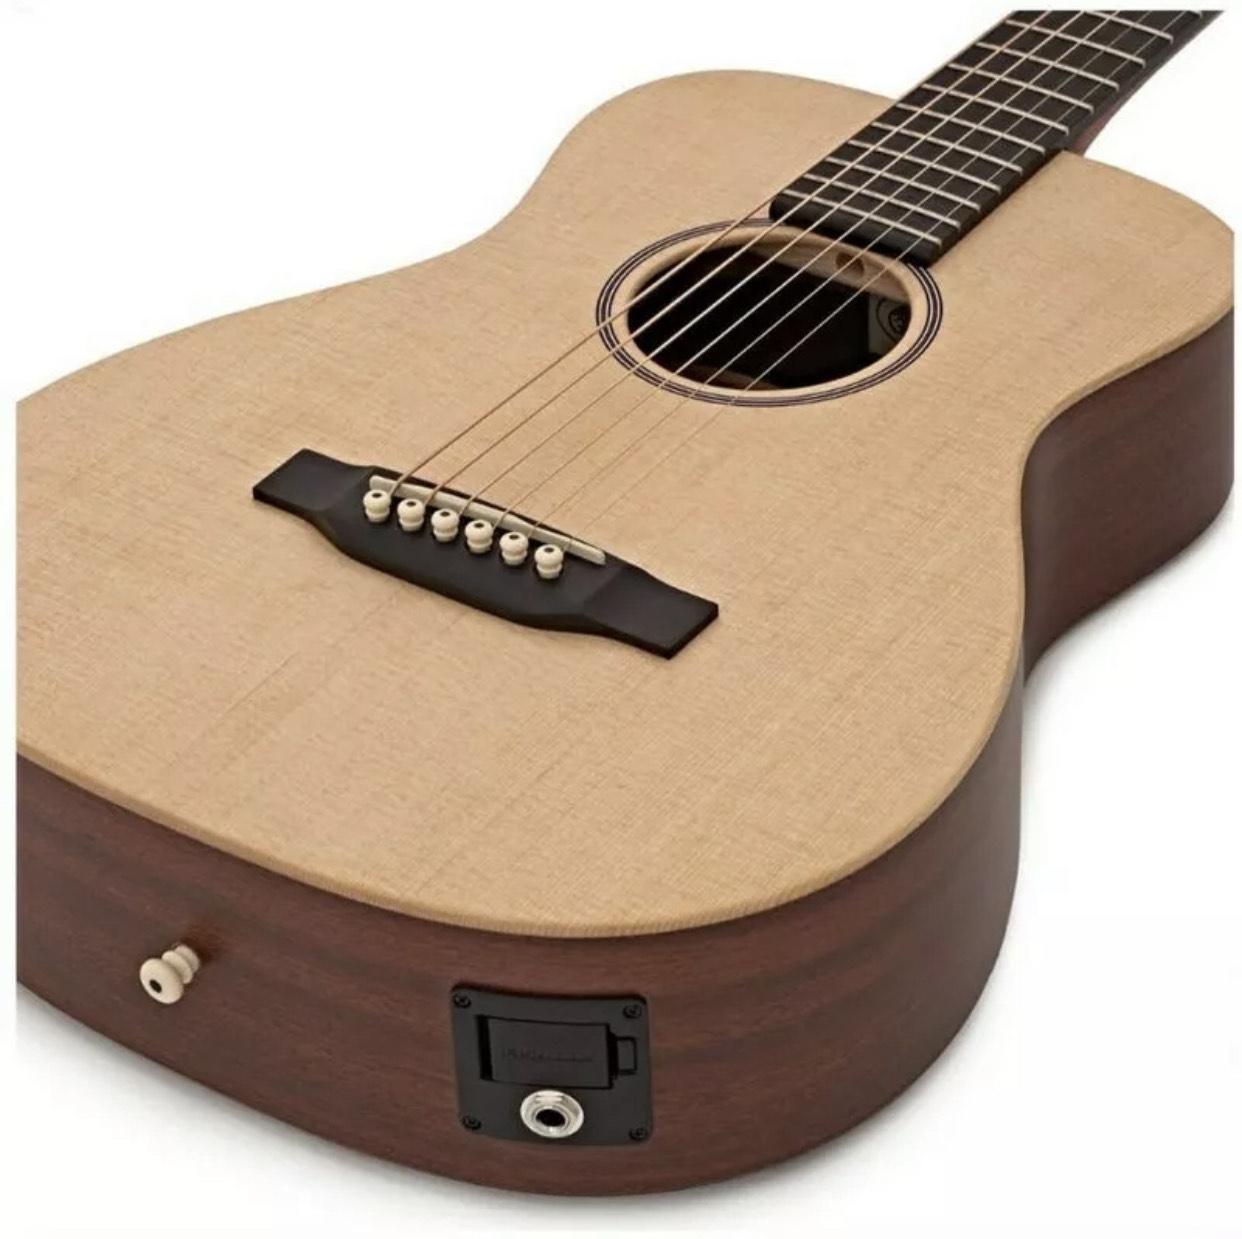 Martin LX1E Little Martin Travel Electro Acoustic Guitar - £431.10 Delivered eBay/GAK